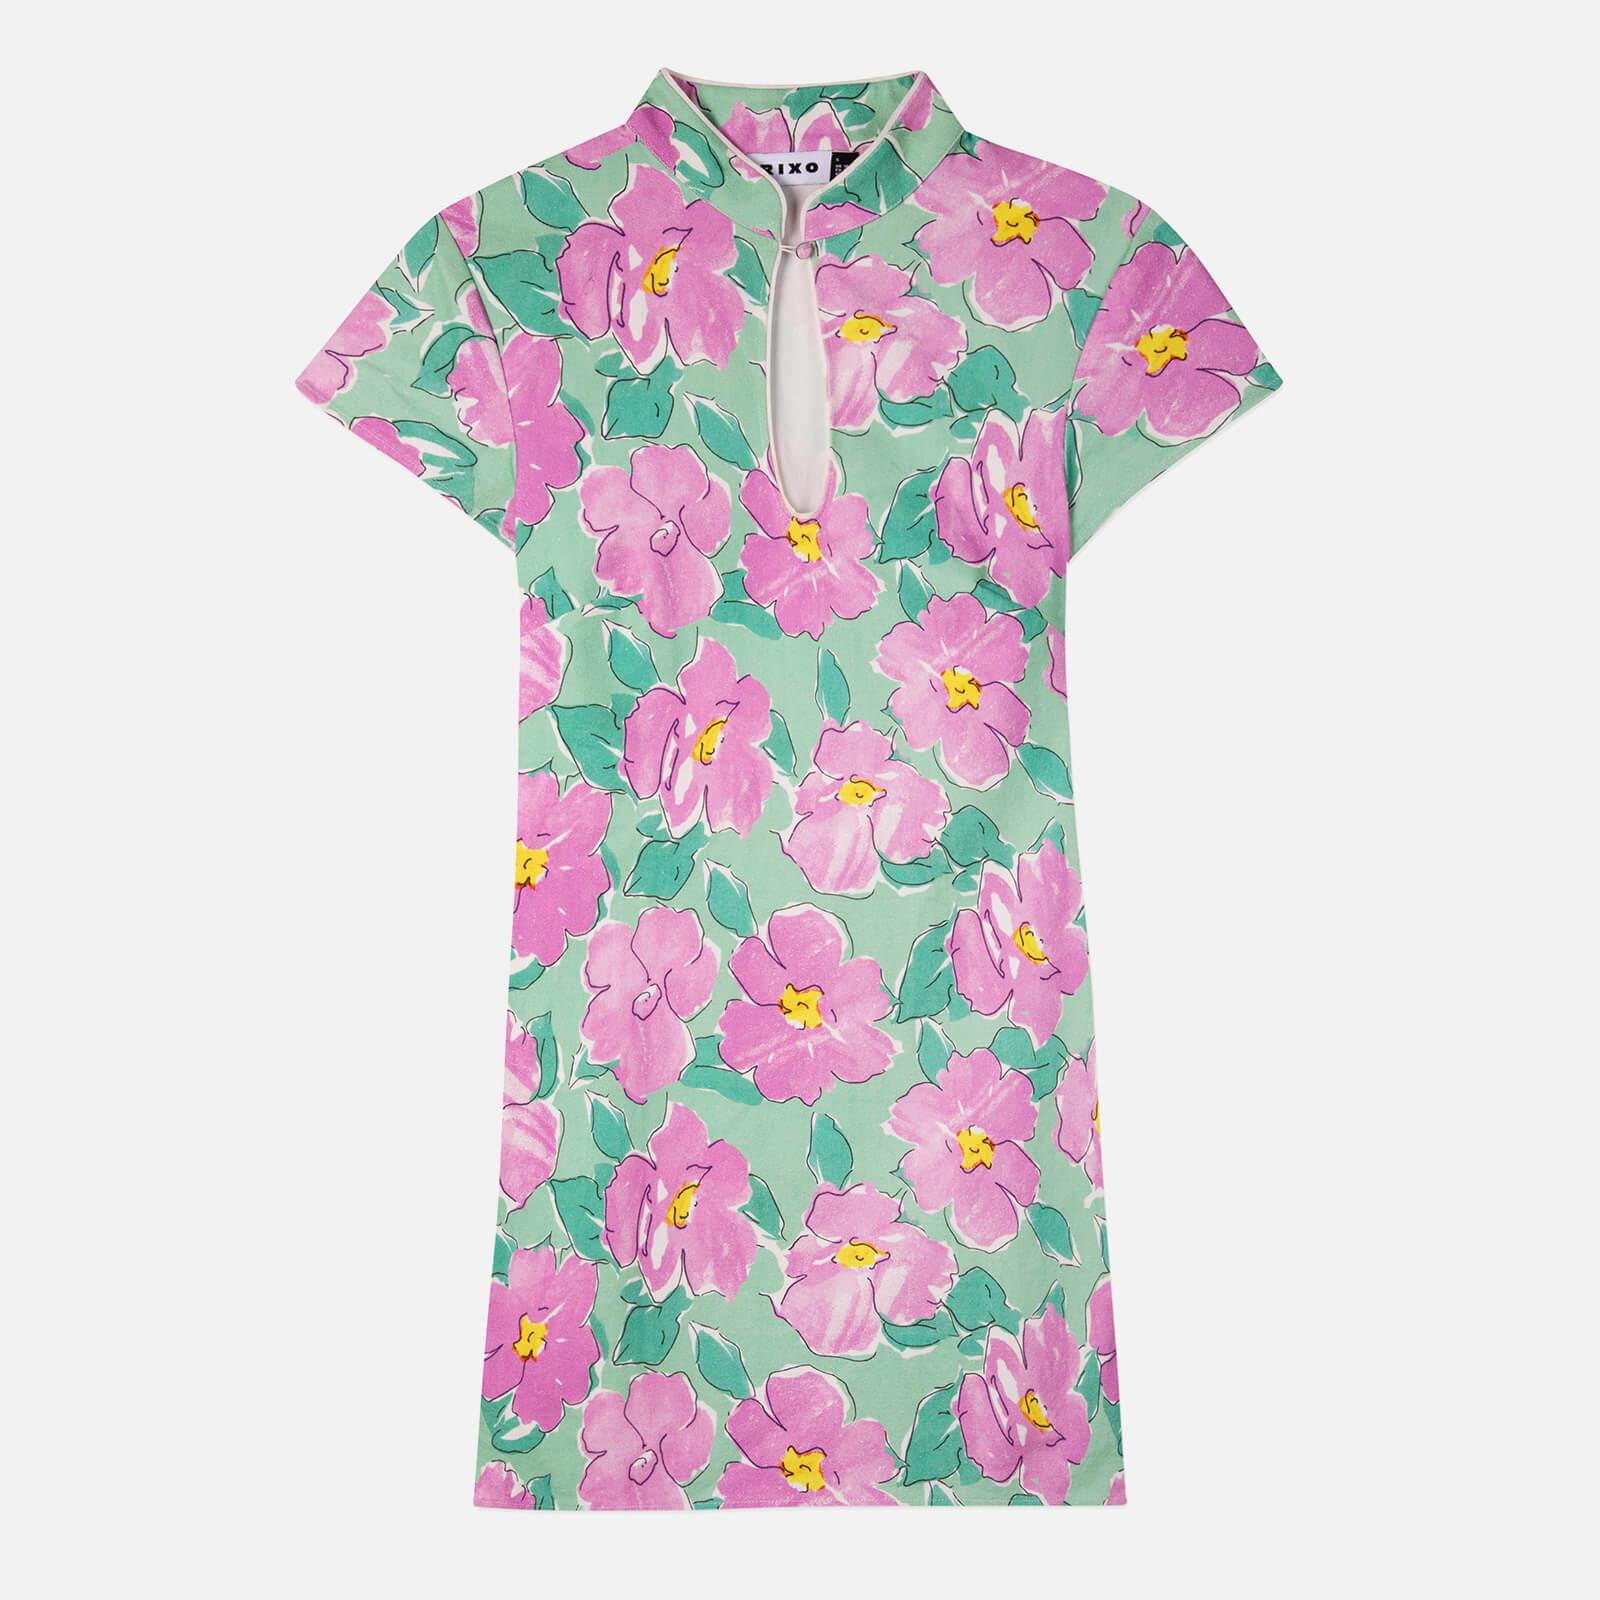 RIXO Women's Lolita Dress - Azalea Bloom Pink - XS